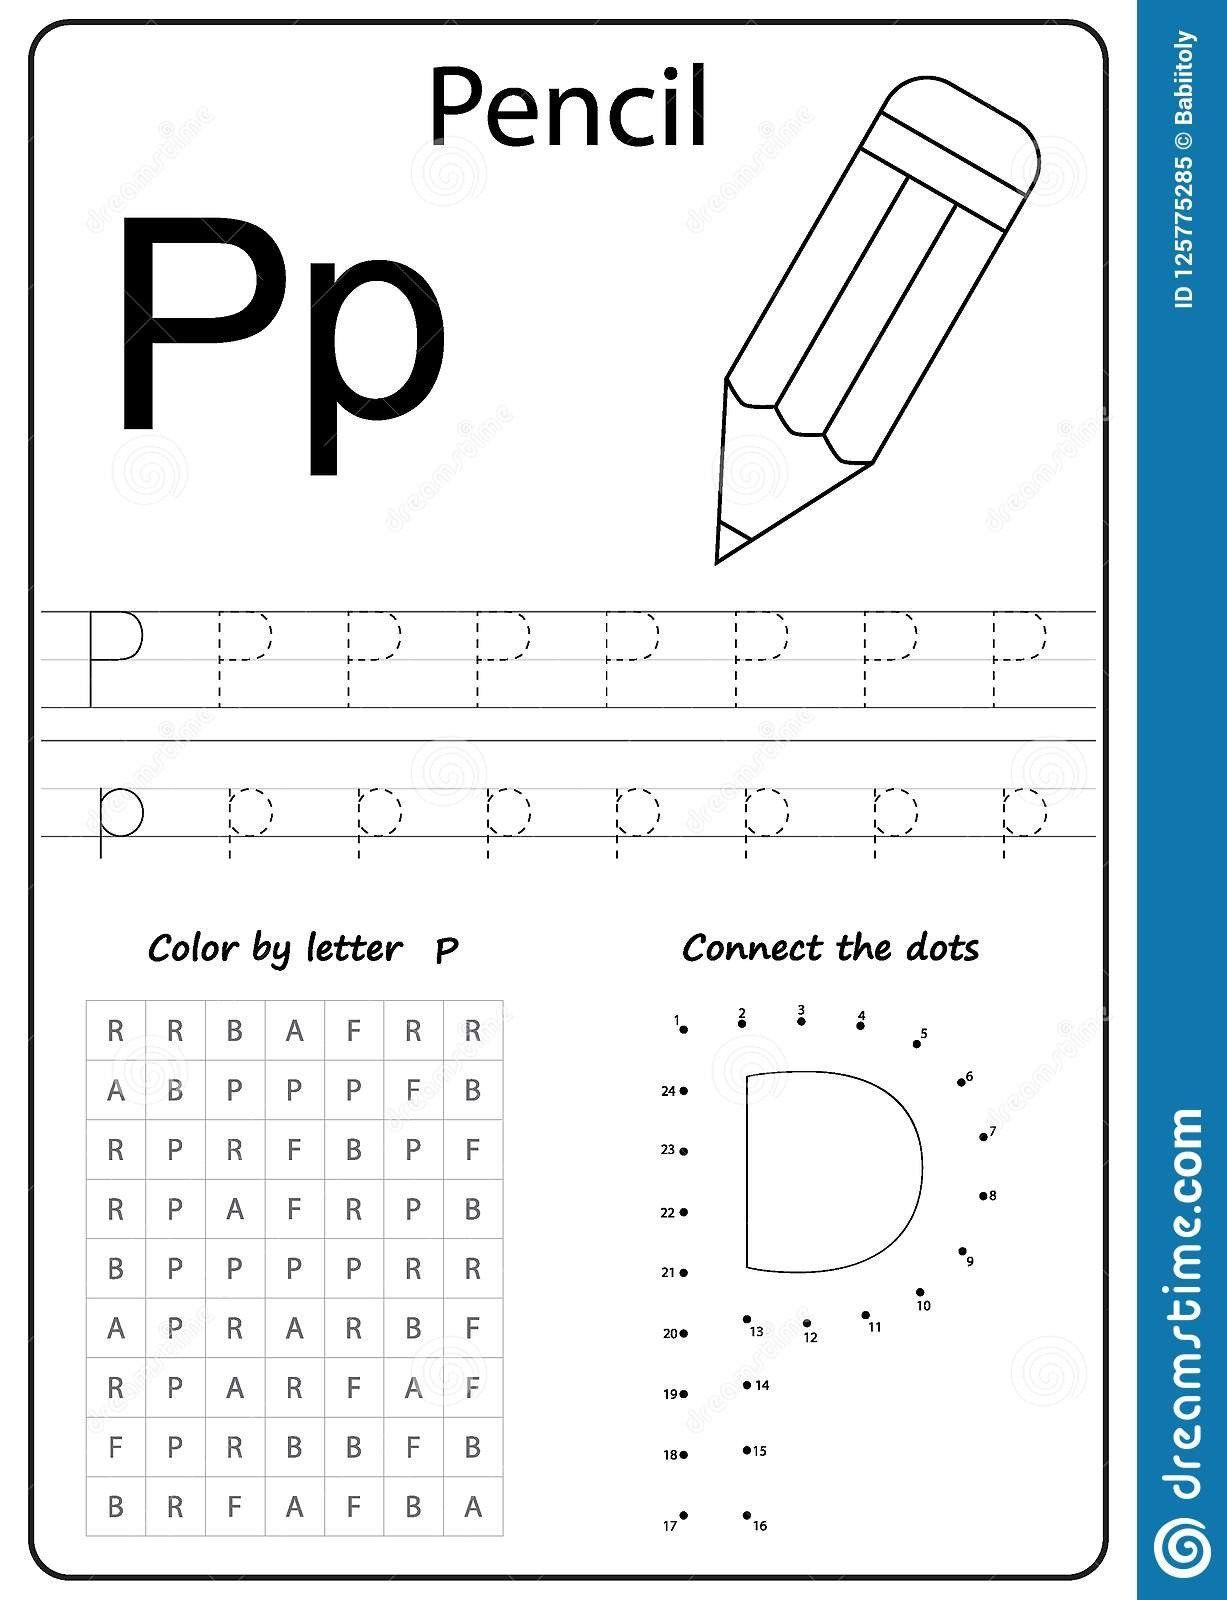 Free Printable Letter P Worksheets 14 Constructive Letter